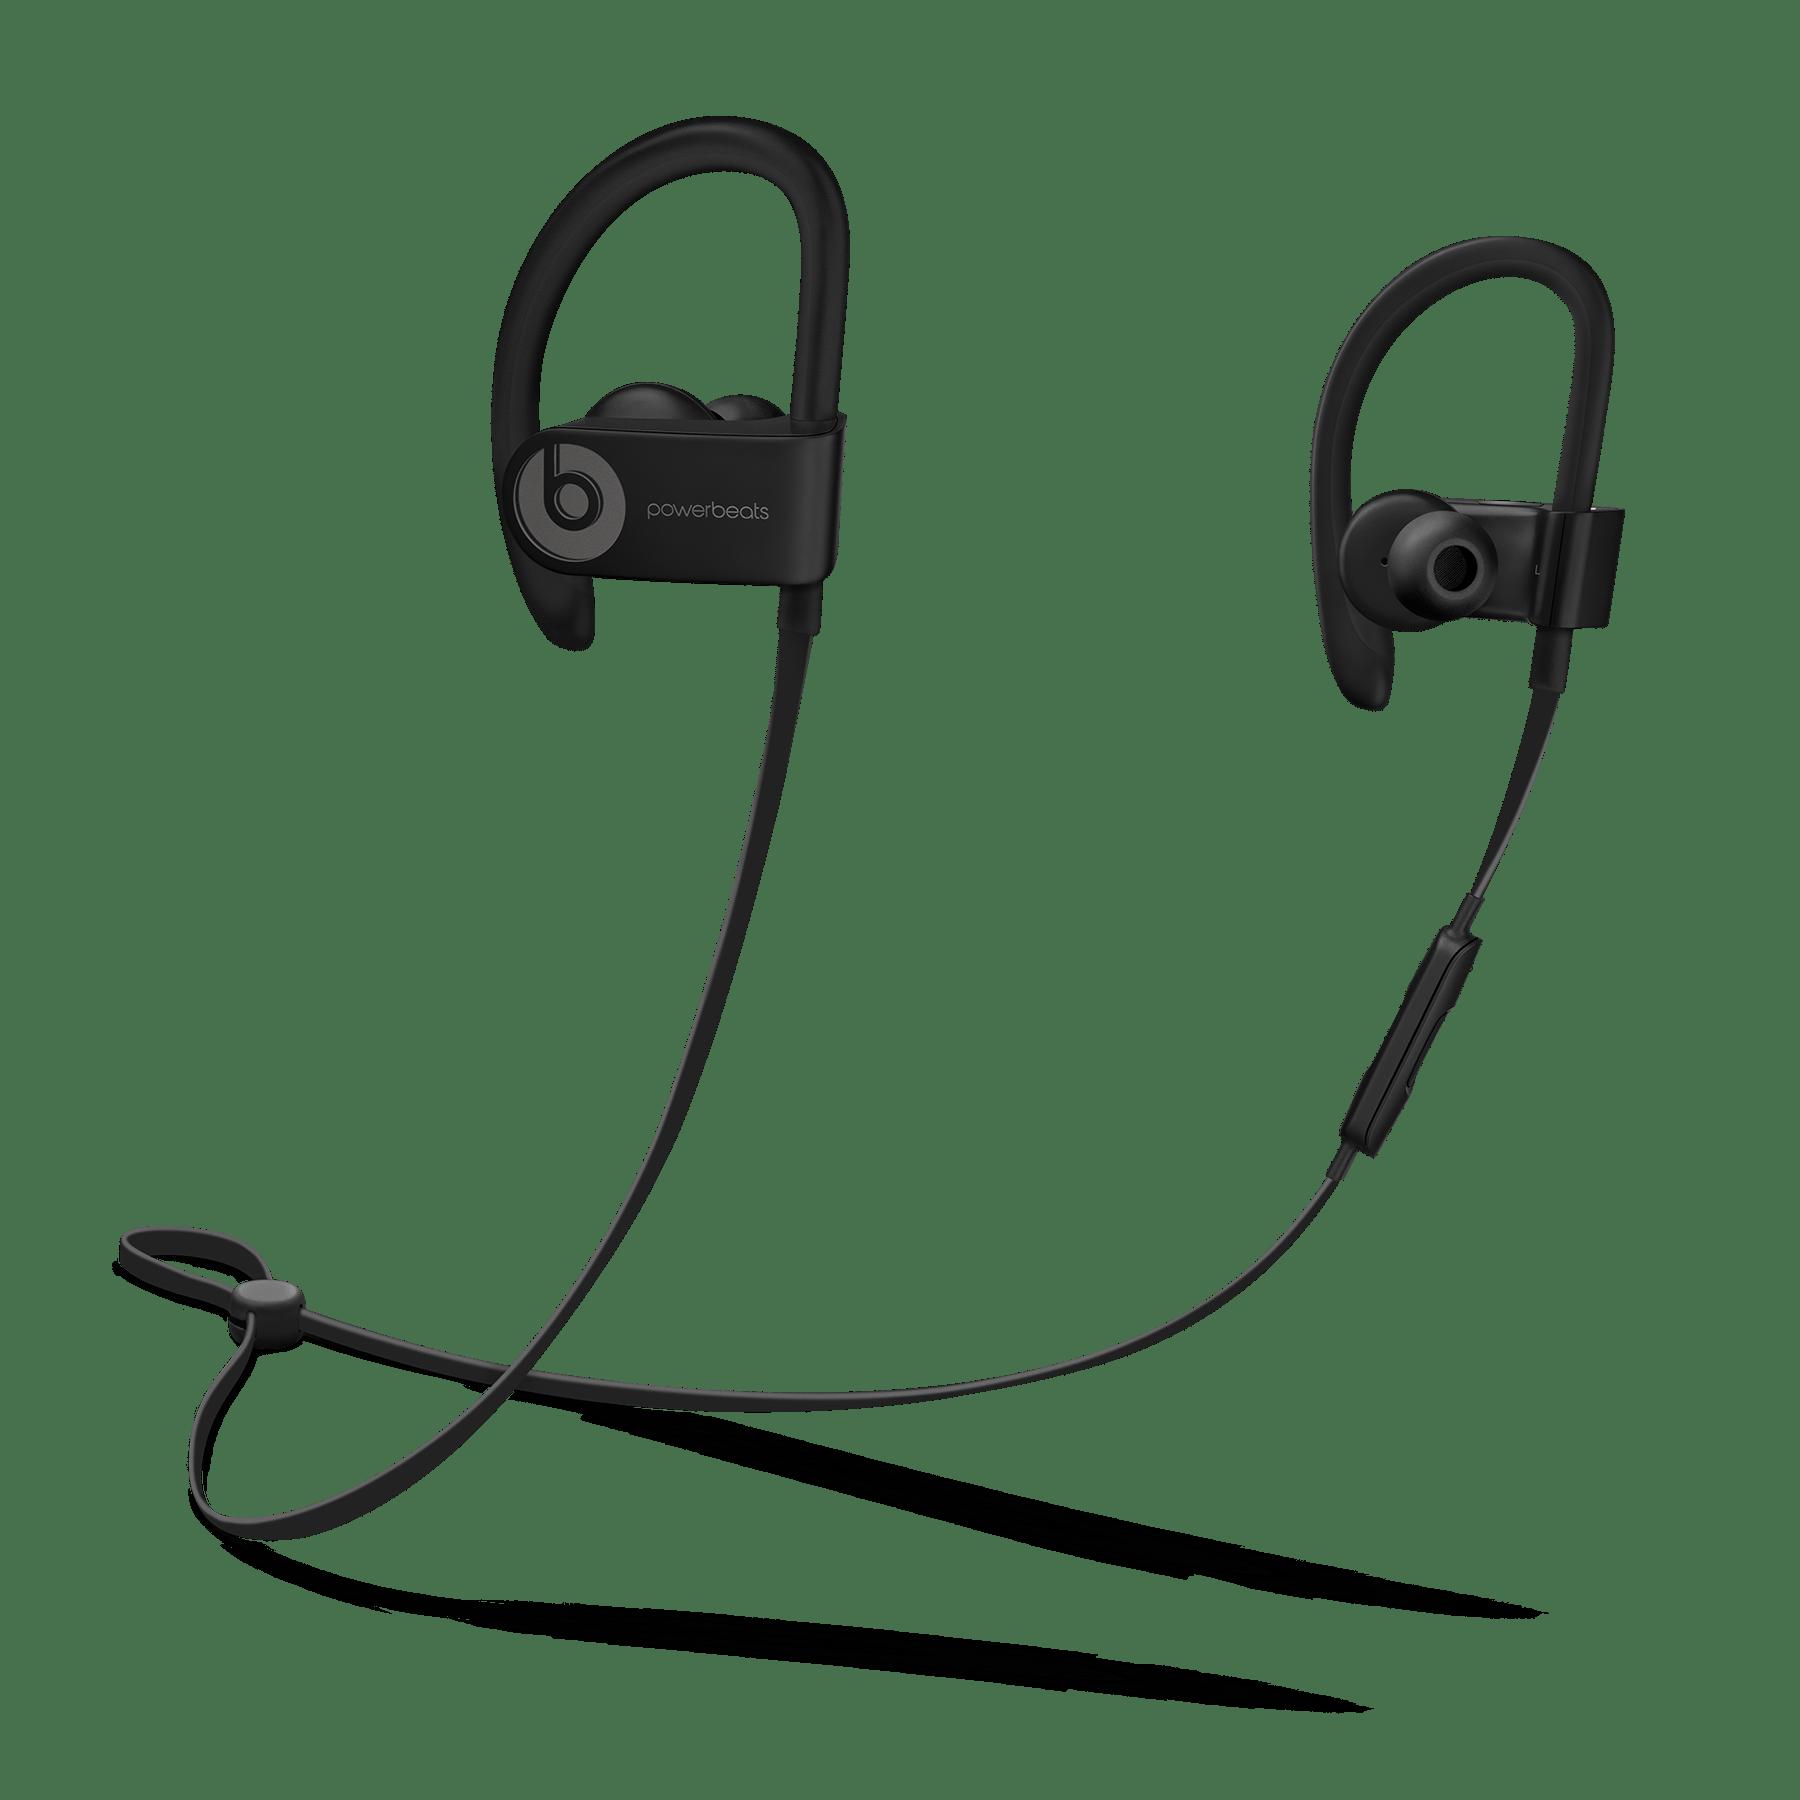 Headphones clipart headphone beats. Powerbeats wireless by dre